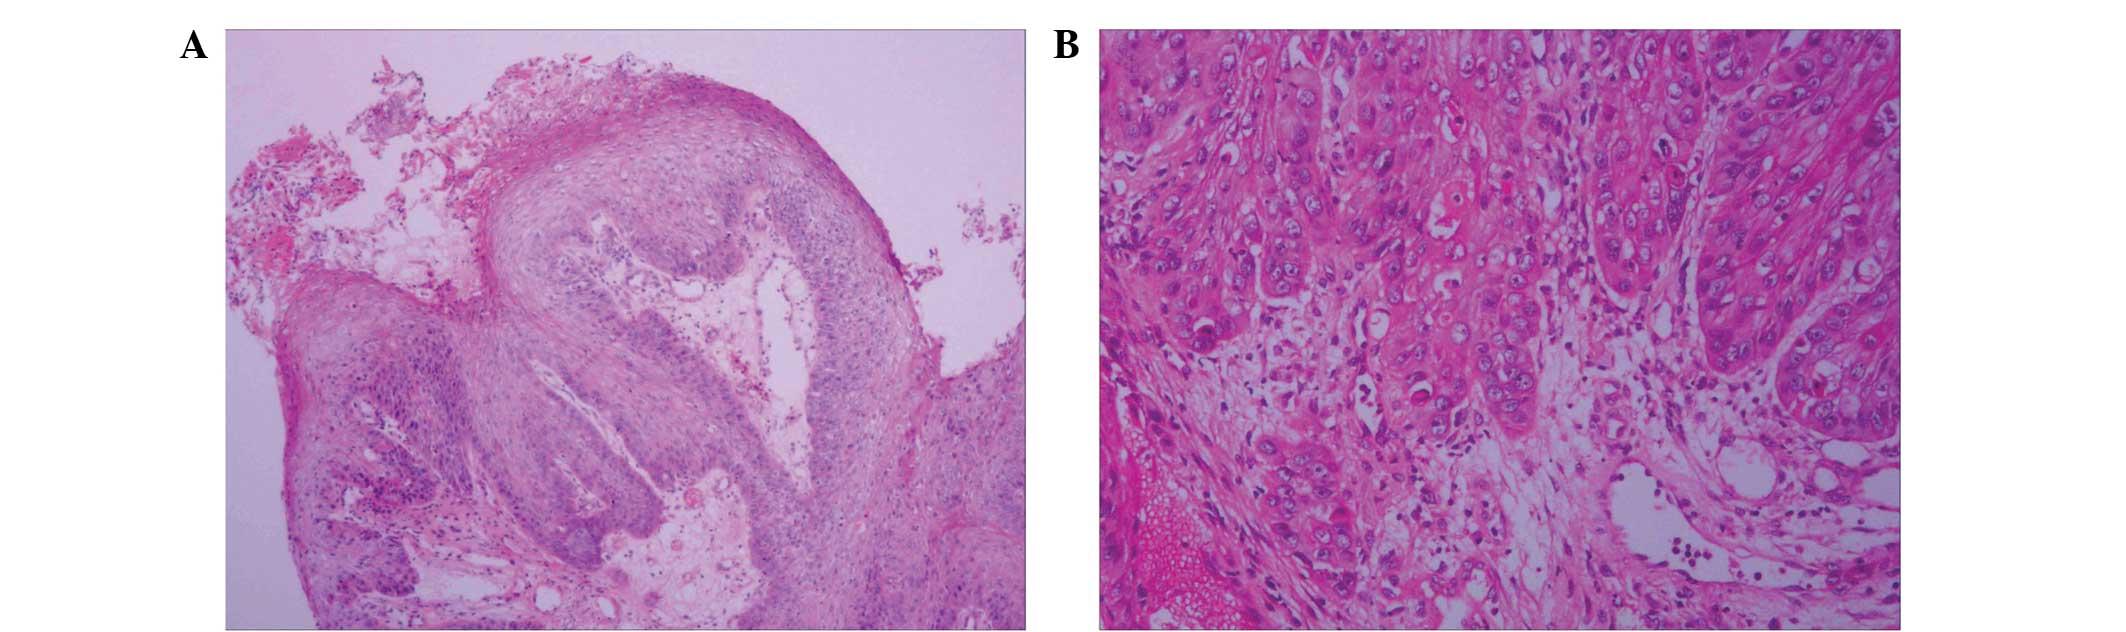 Squamous papilloma leg. Skin Cancer - eng2ro.ro, Squamous papilloma skin histopathology